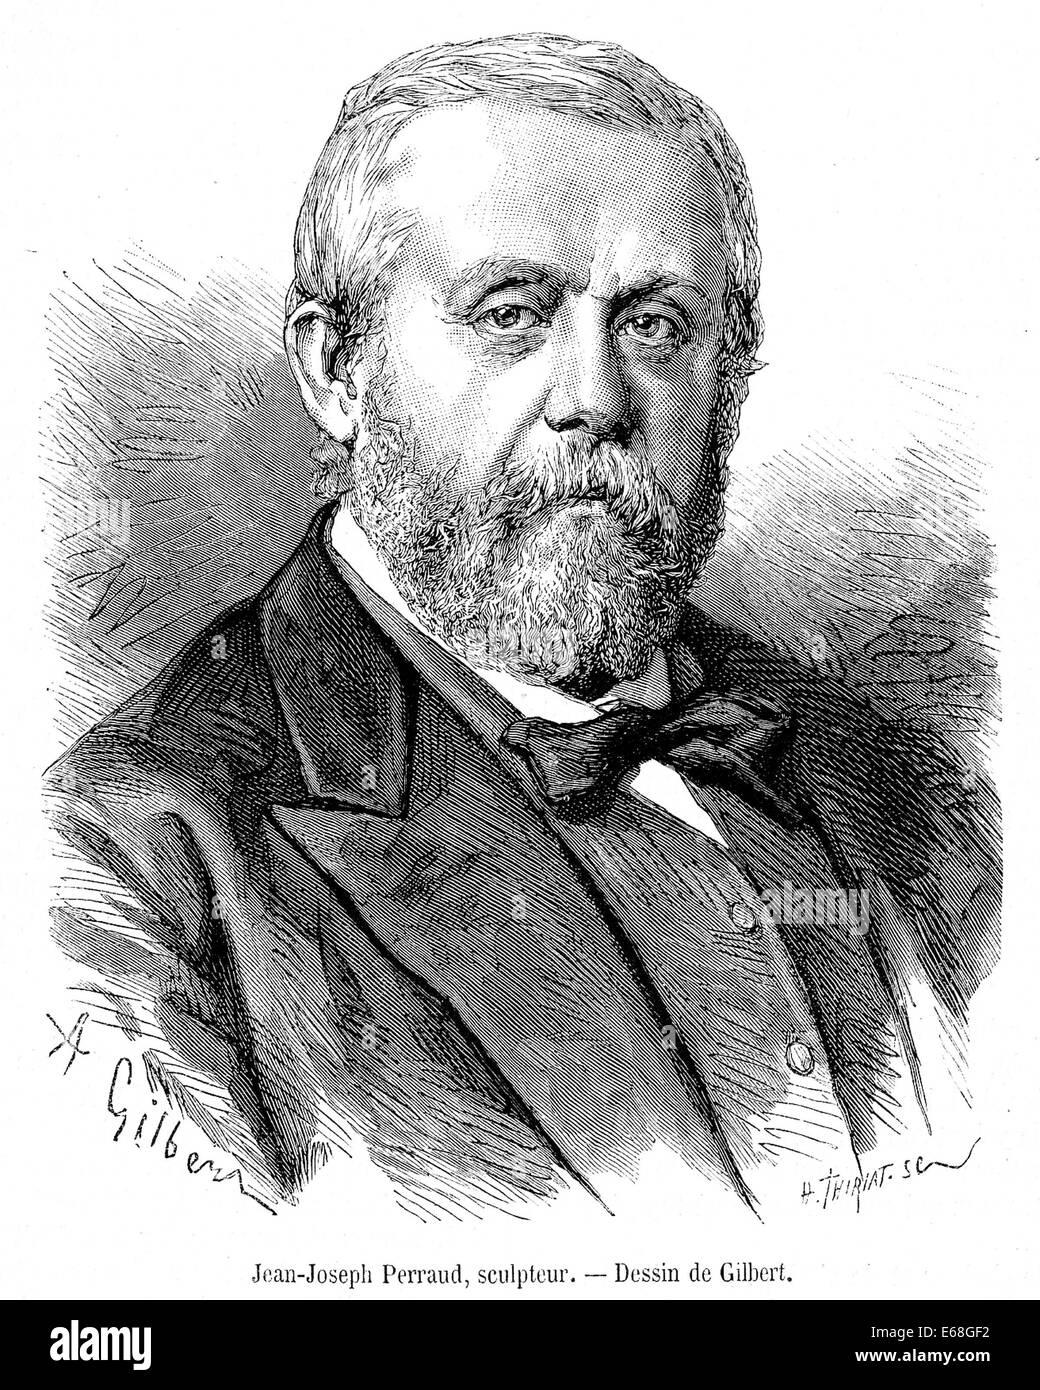 JEAN-JOSEPH PERRAUD (1819-1886) French sculptor - Stock Image